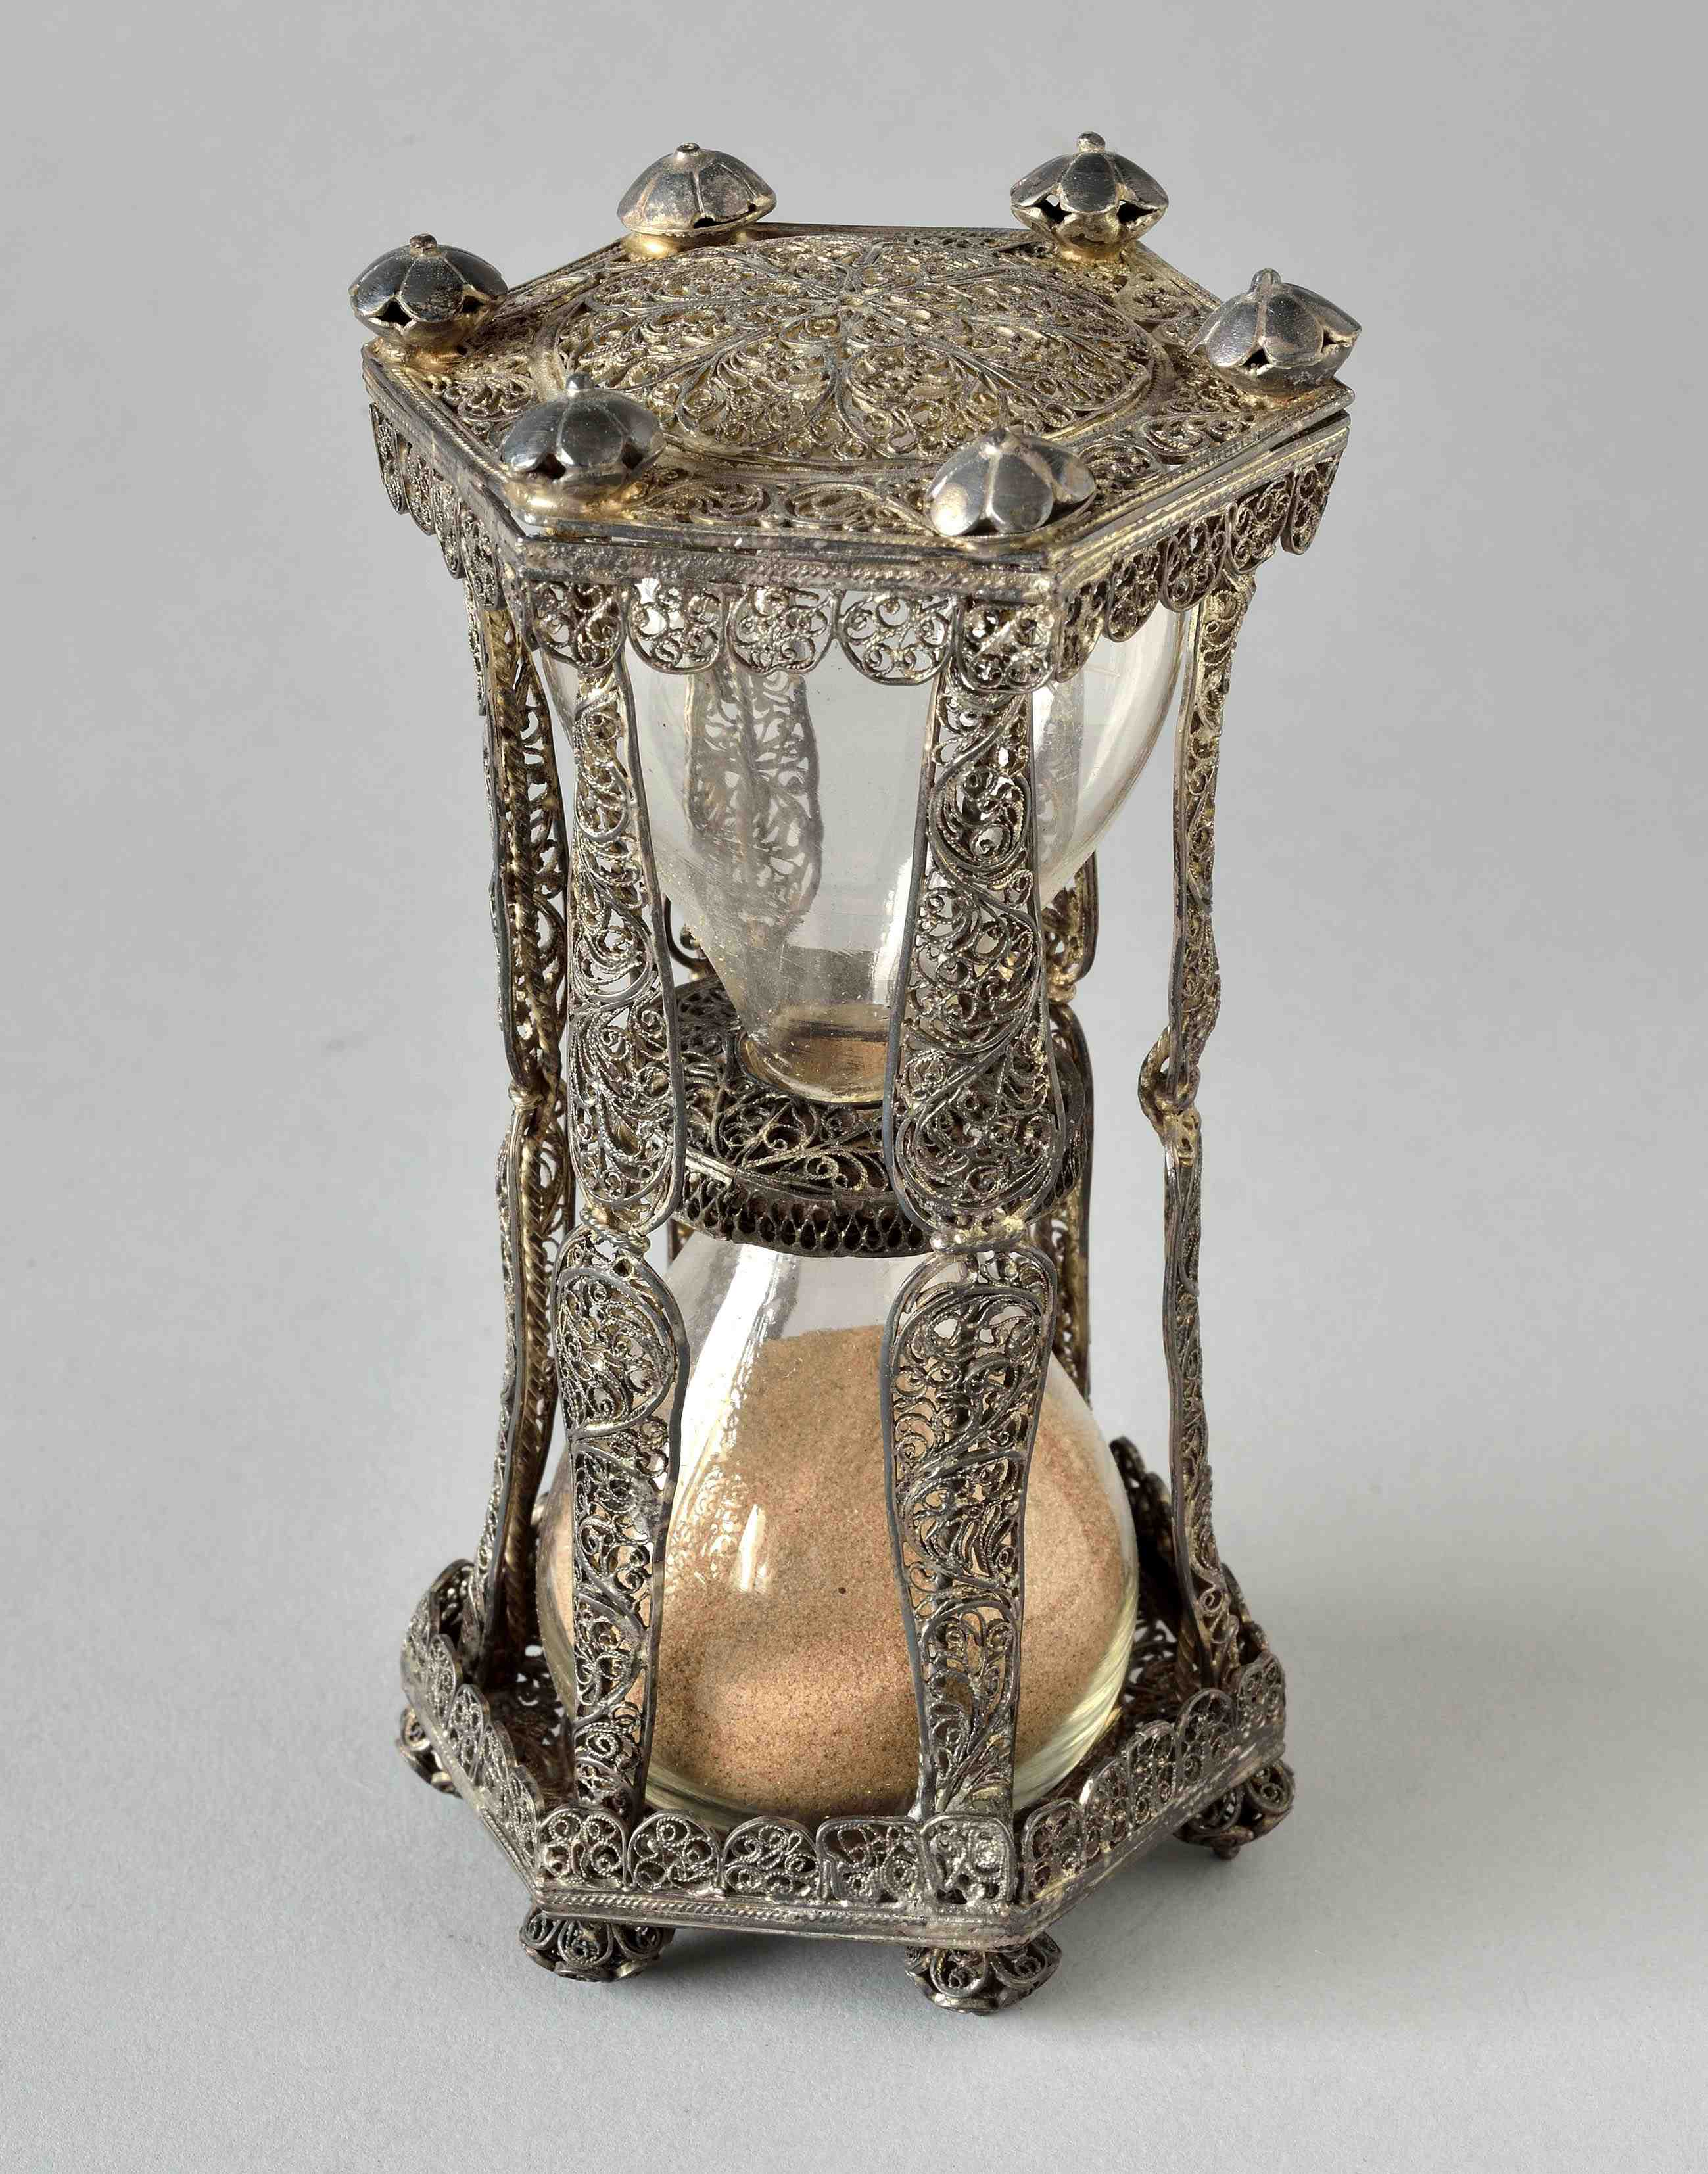 Sanduhr aus venezianischem Silber (Foto: Delalande, Paris)